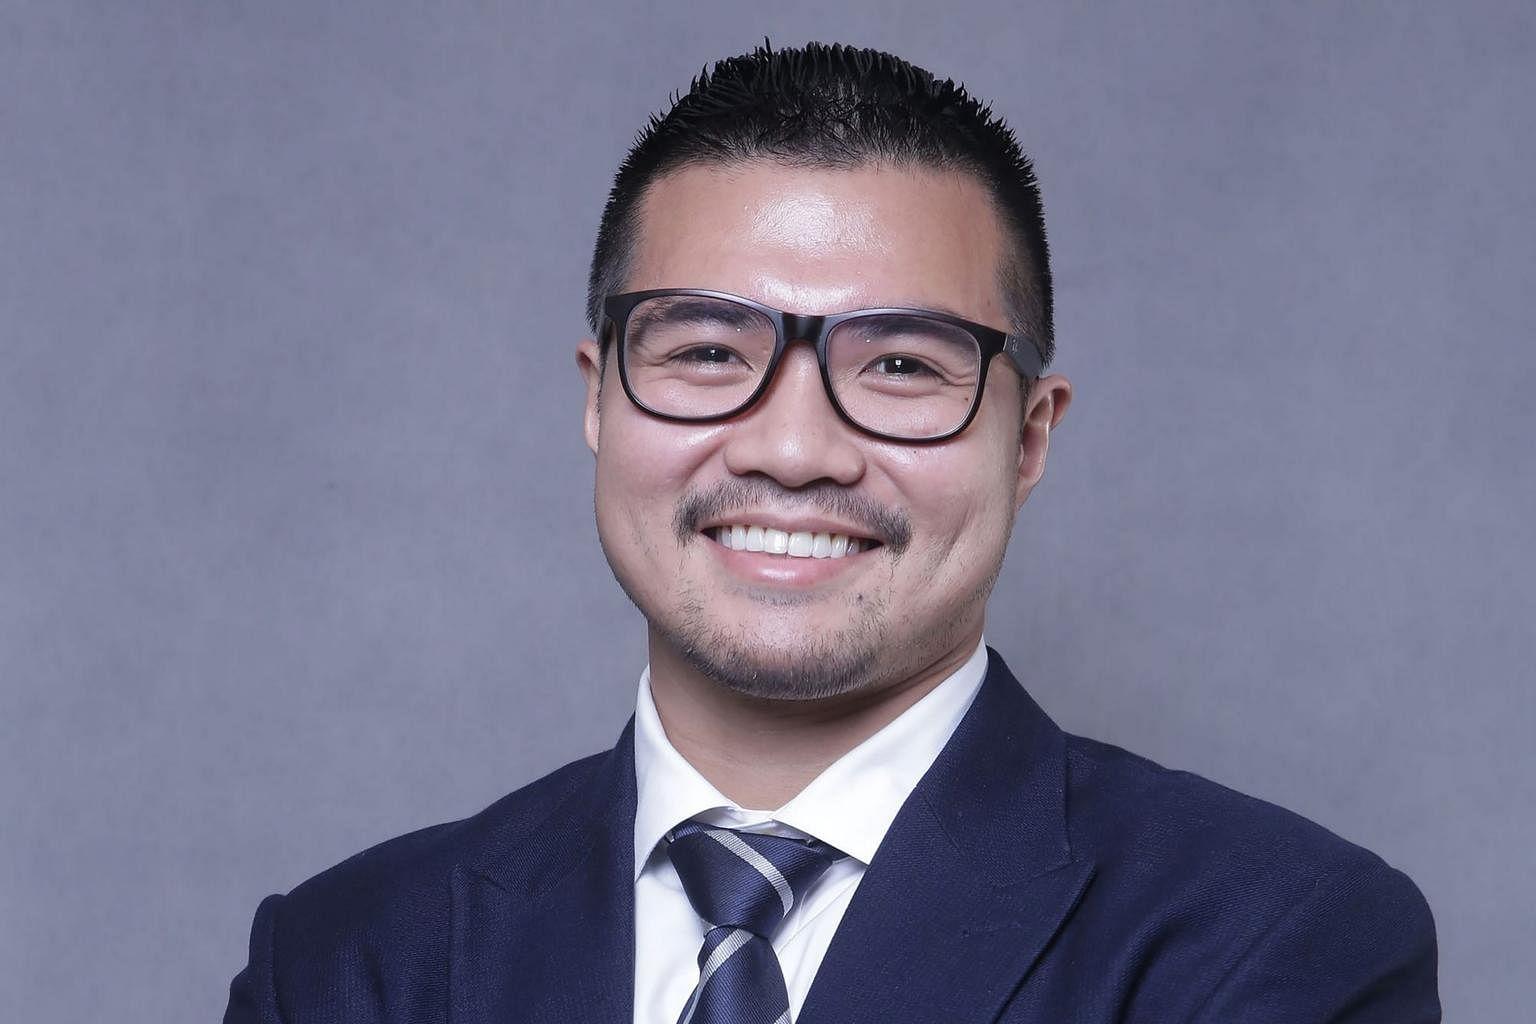 malaysia-minister-sex-movie-petite-shoes-woburn-ma